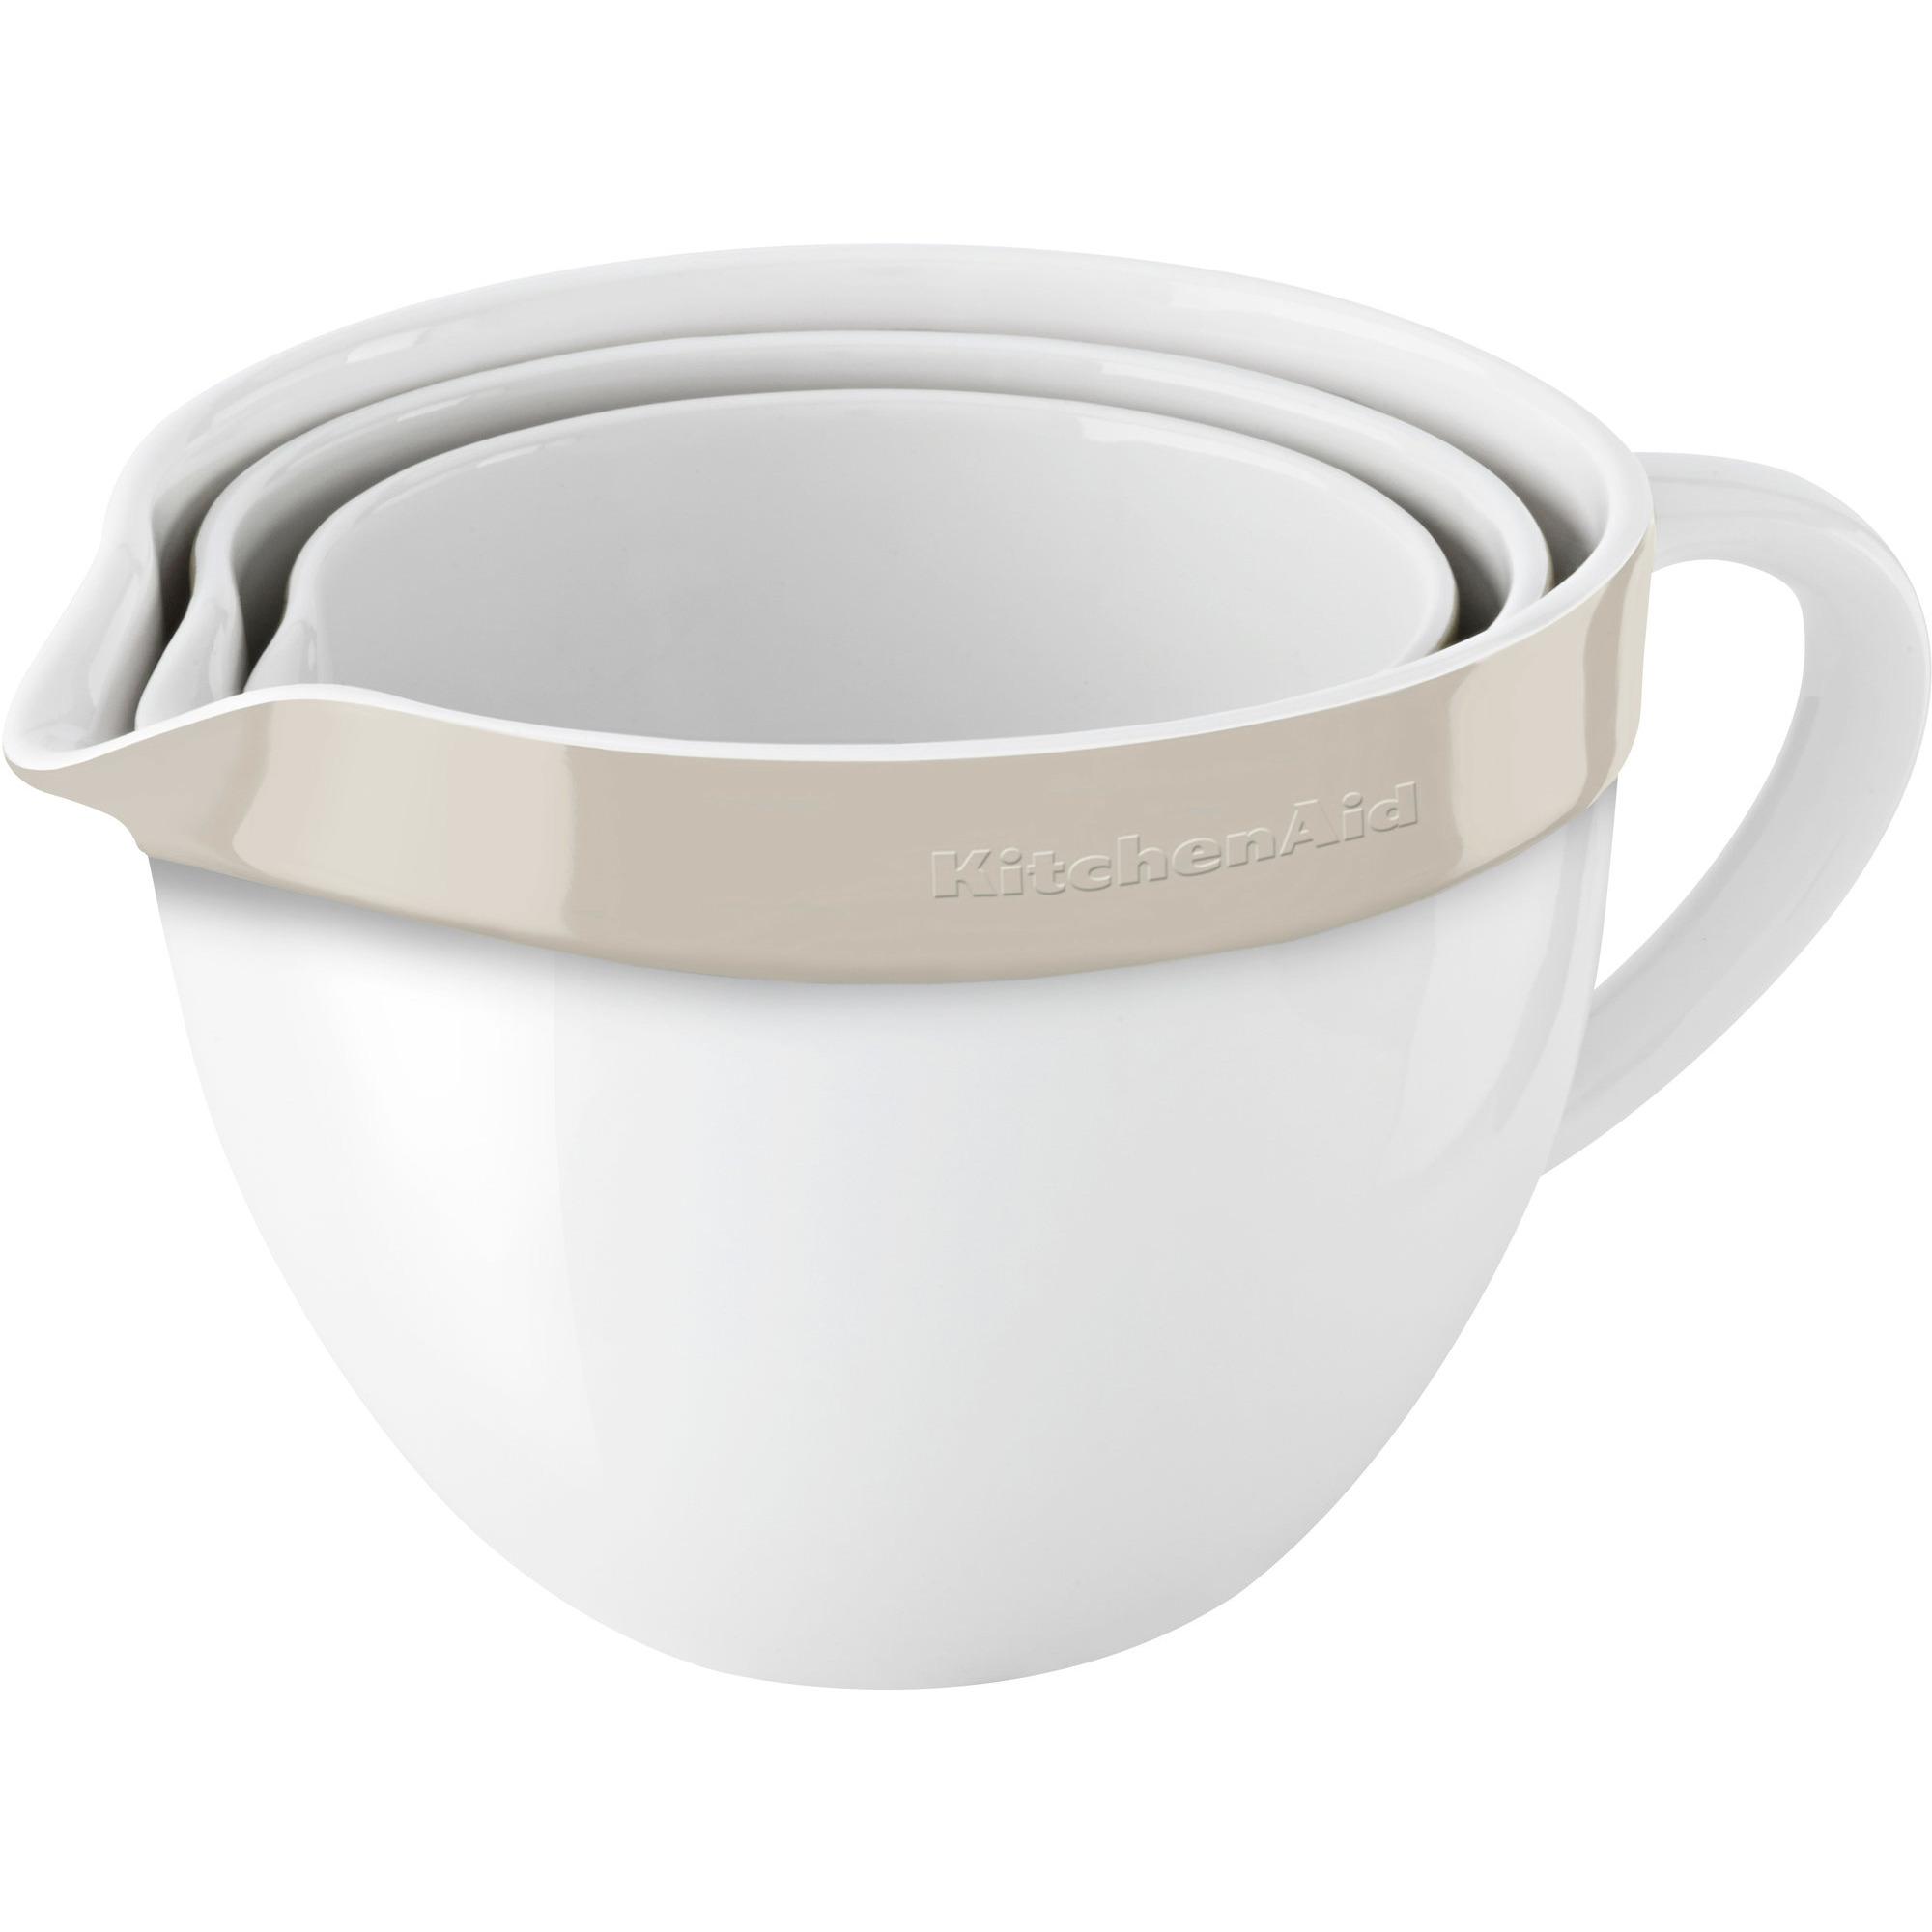 KitchenAid Skålset Keramik Vit/Creme